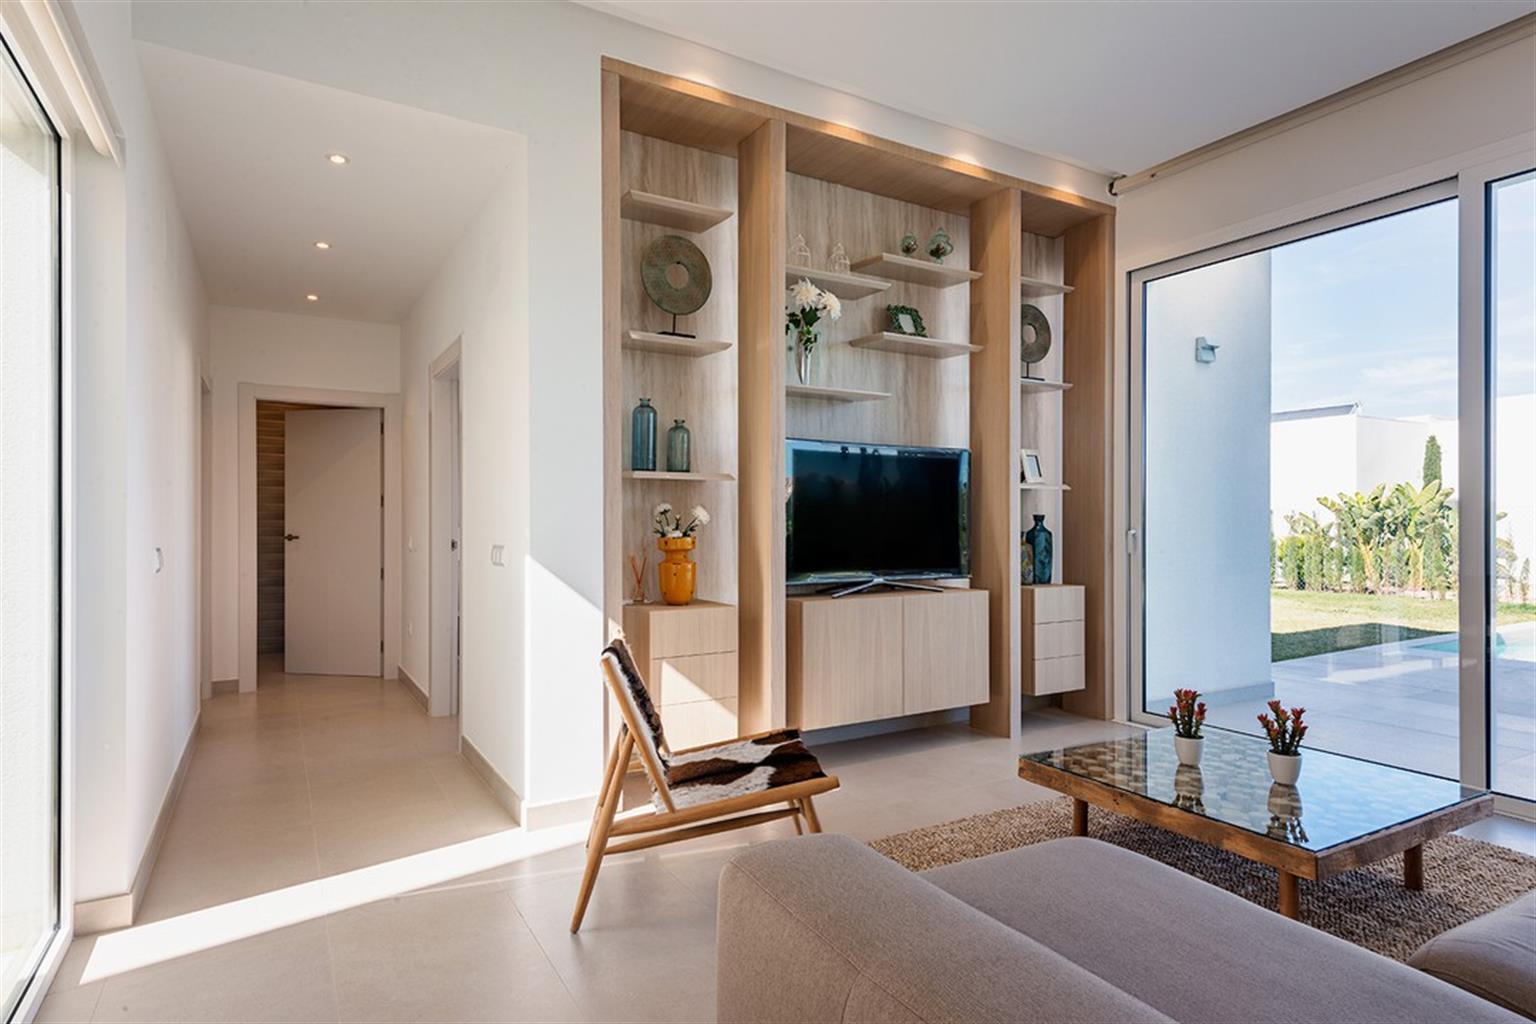 Maison - Villamartin - #4228155-16